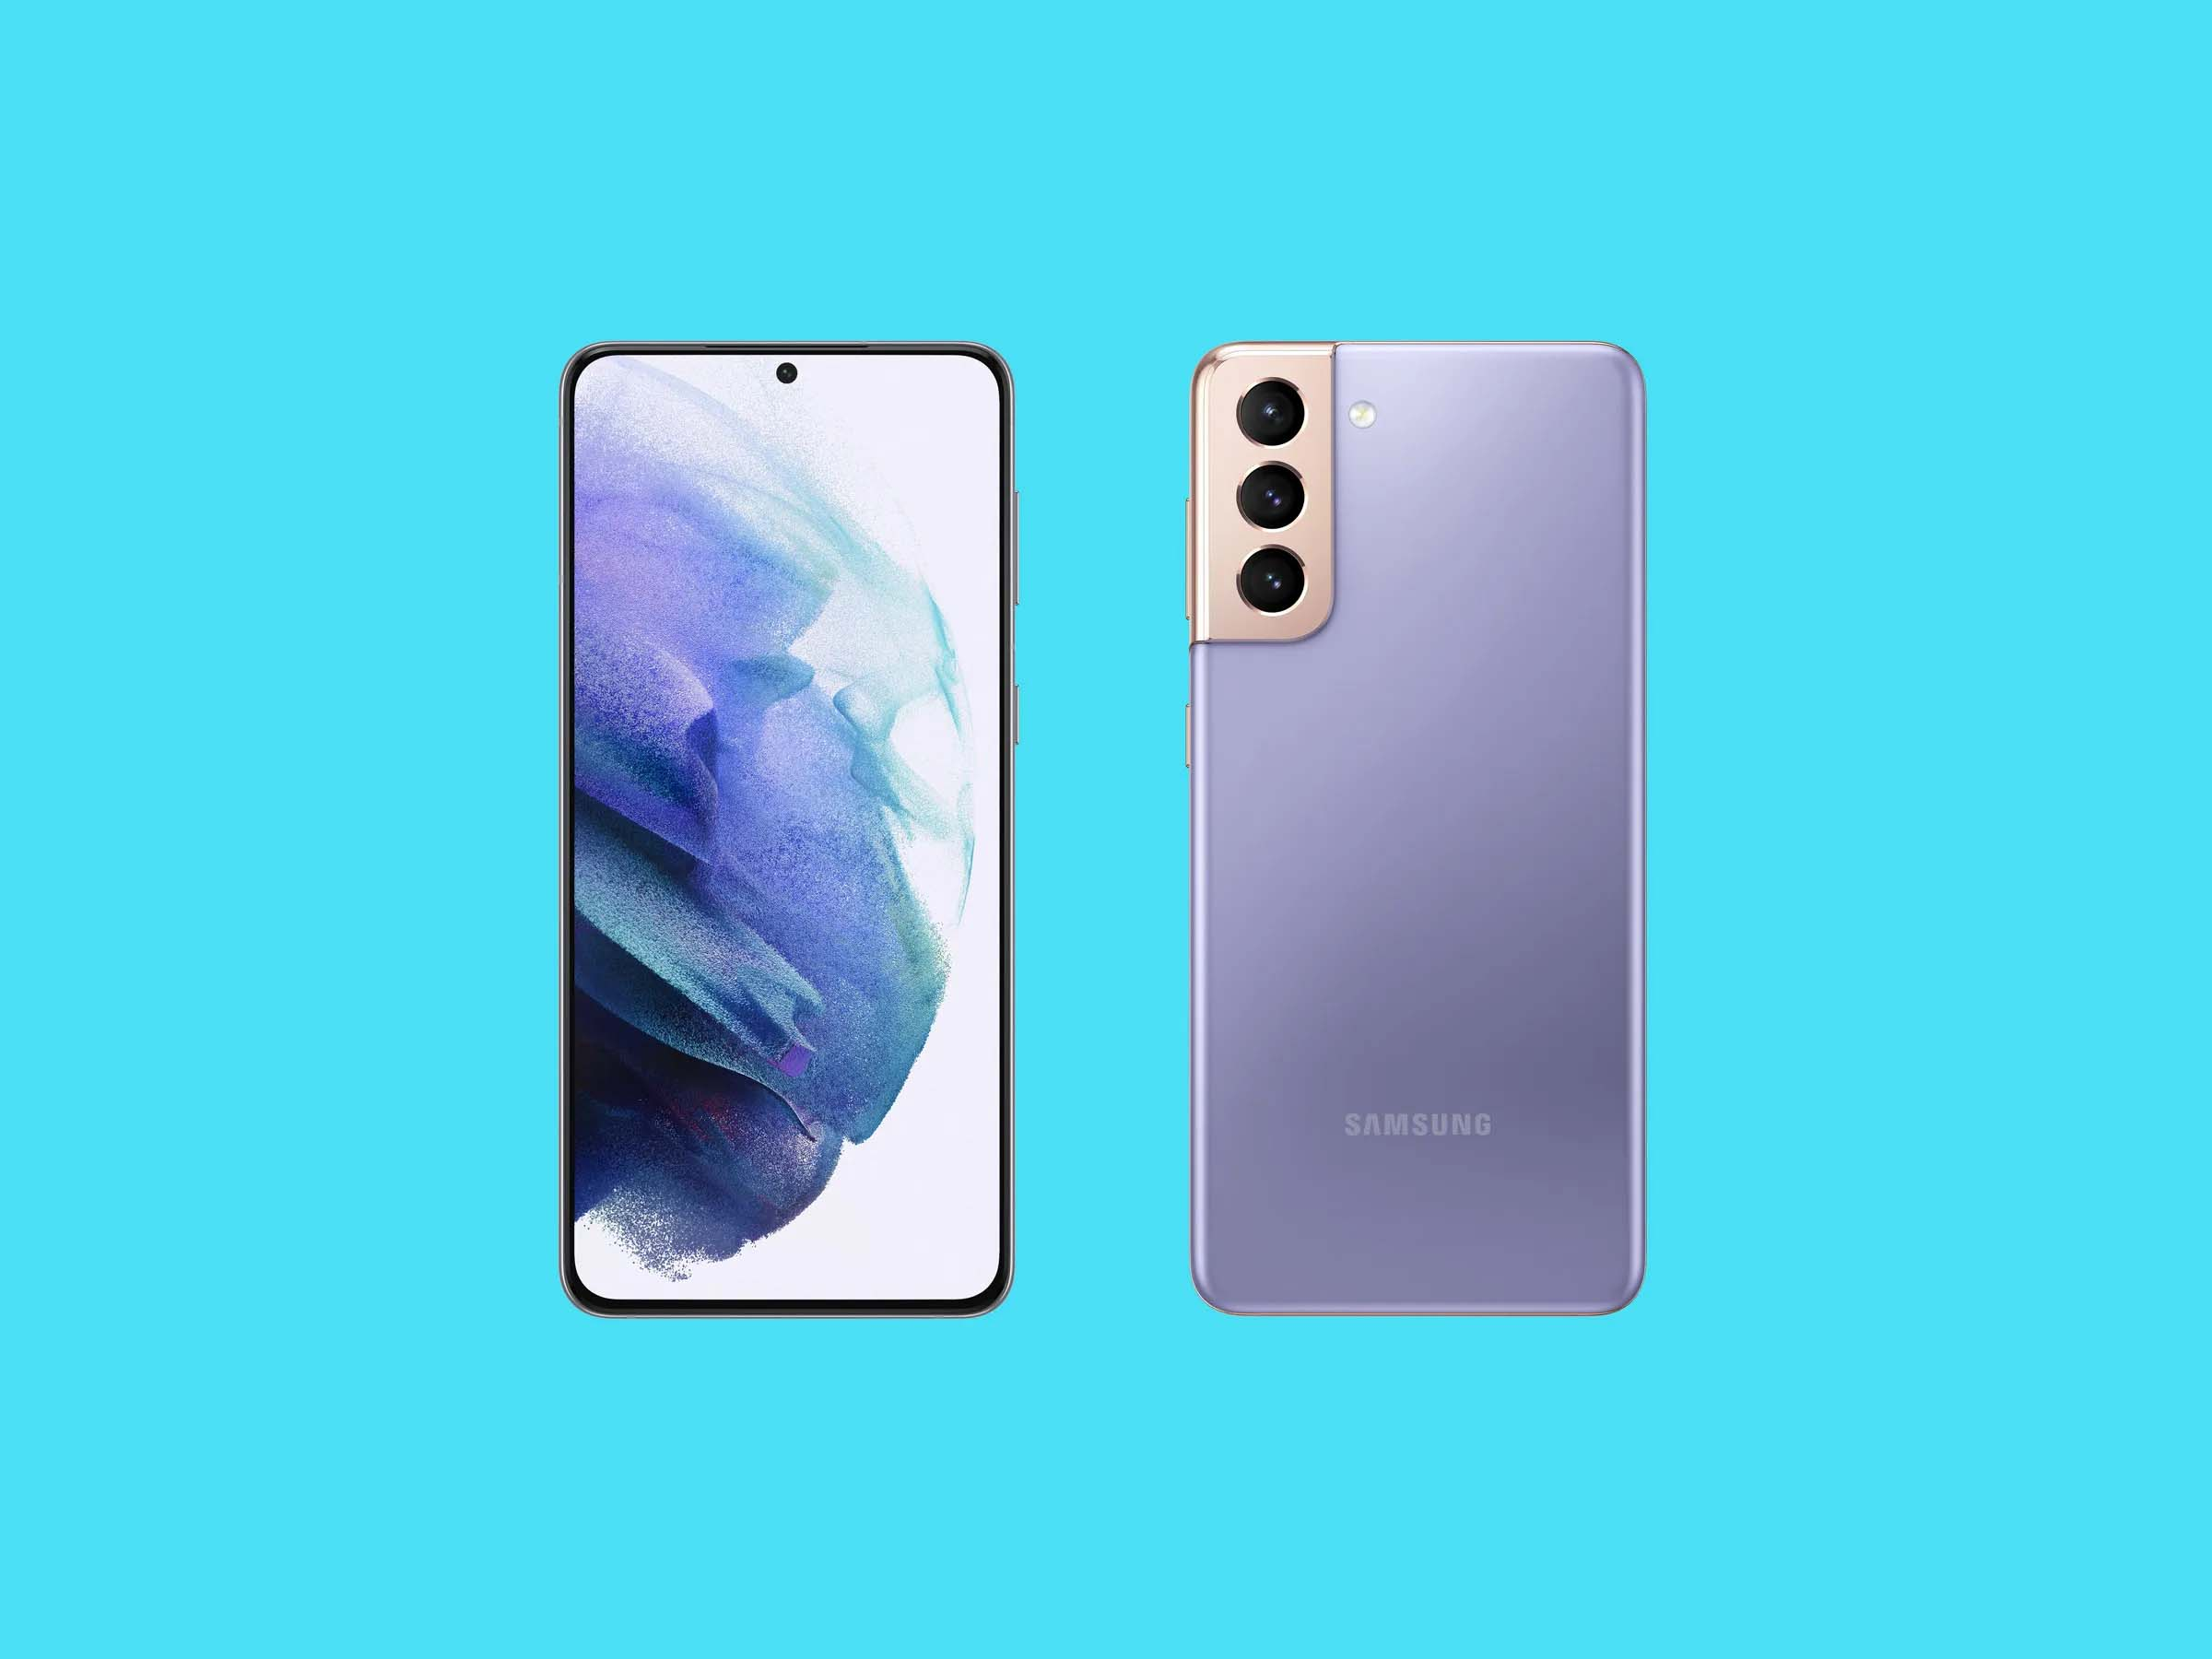 Samsung Galaxy S21 Ultra 108mp